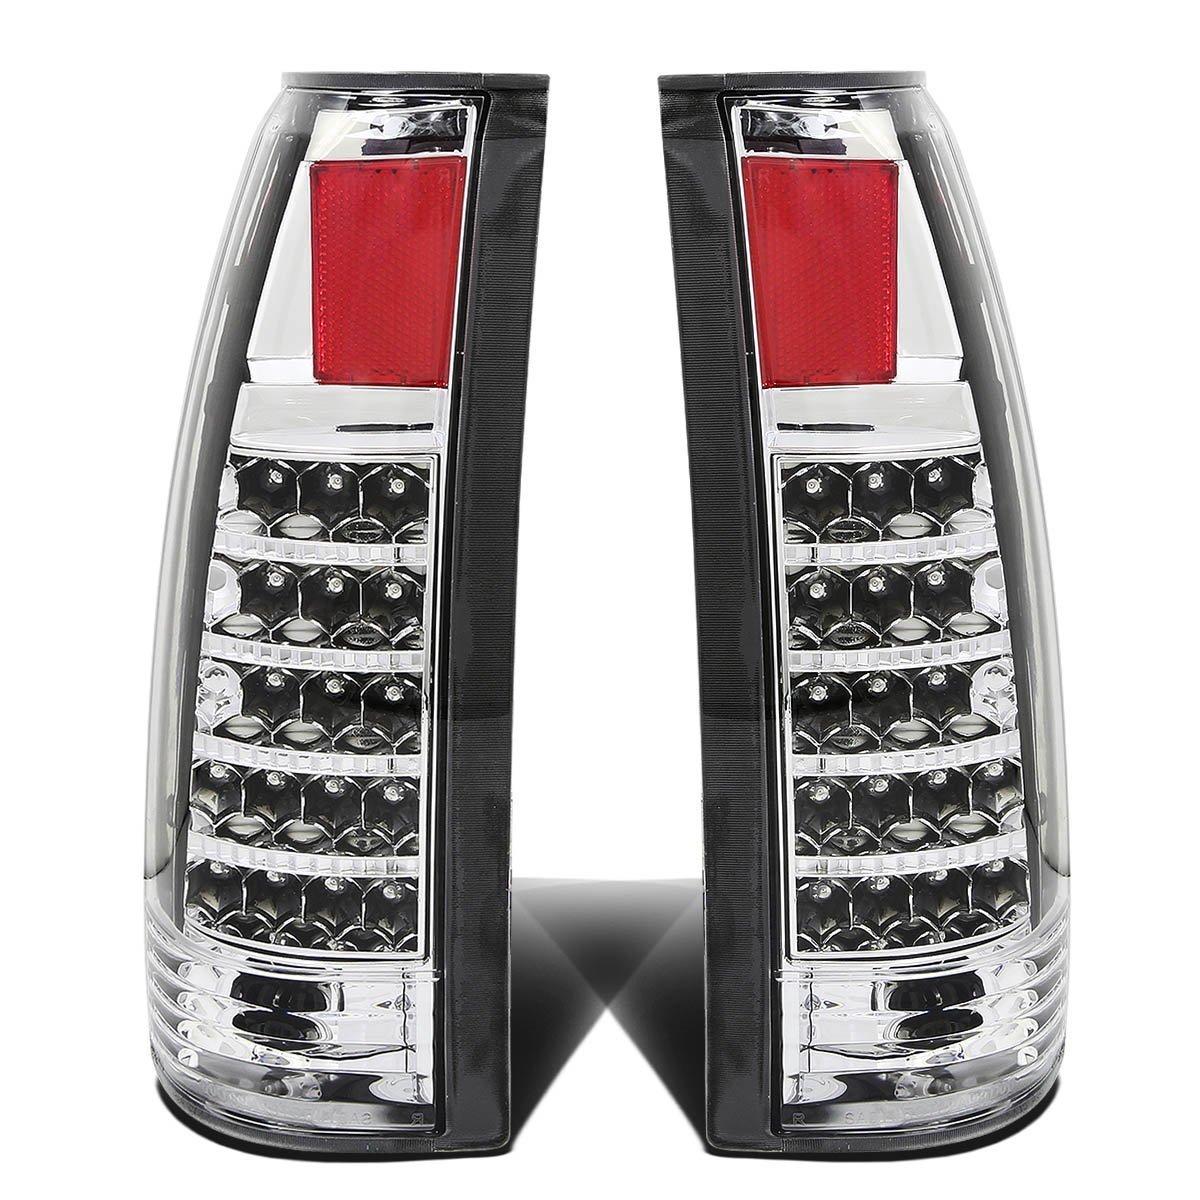 Rxmotor Chevy C1500 C2500 C3500 Full Size Blazer Tahoe GMC Yukon Suburban 1500 2500 Pickup Tail Light LED Rear Brake Lights Lamps Lamp Pair (Clear Chrome)